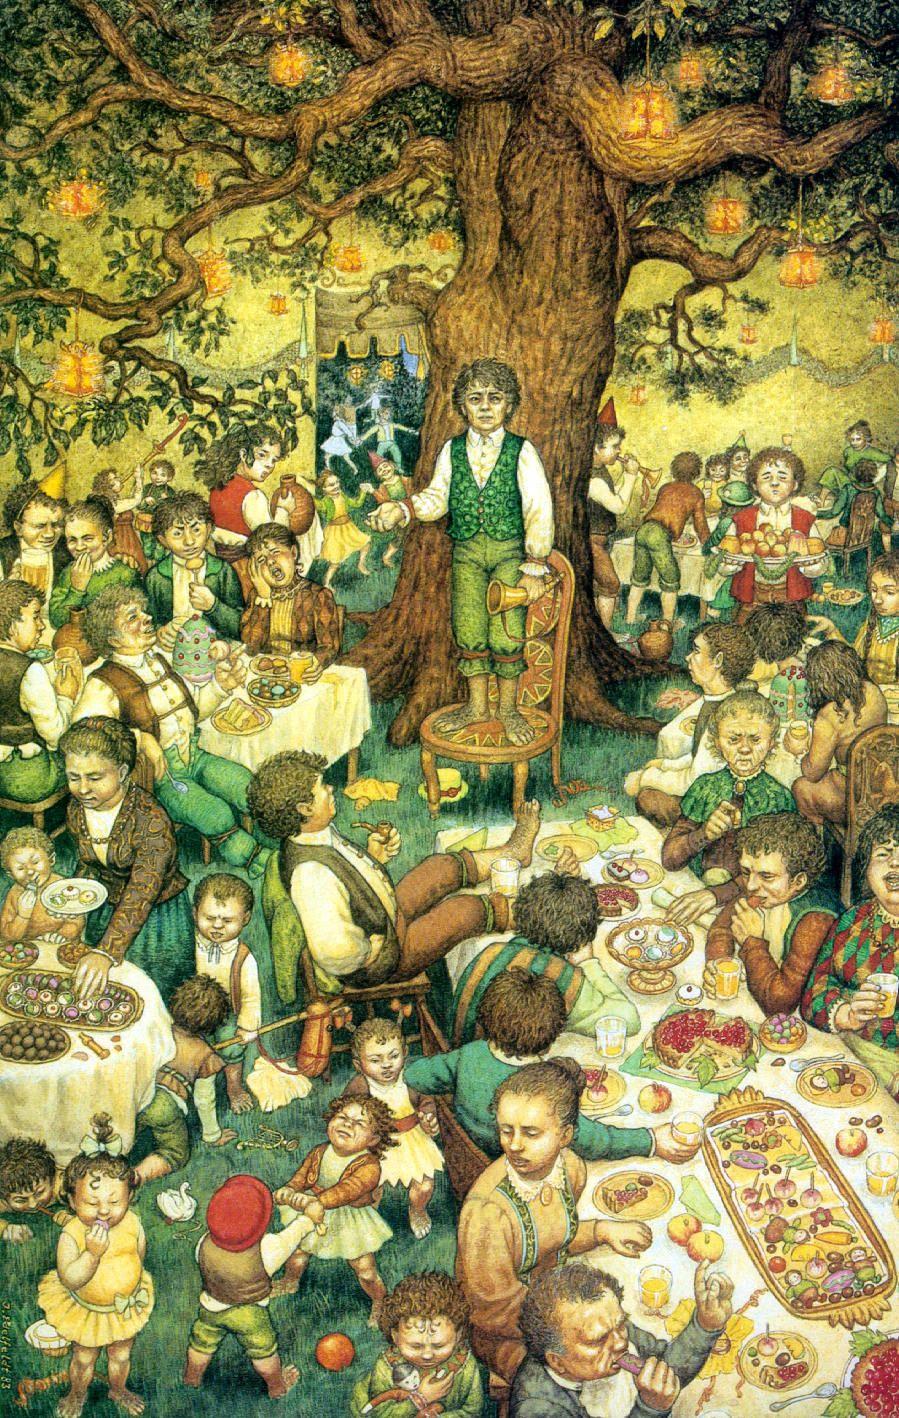 Fiesta de cumpleaños de Bilbo, Inger Edelfeldt